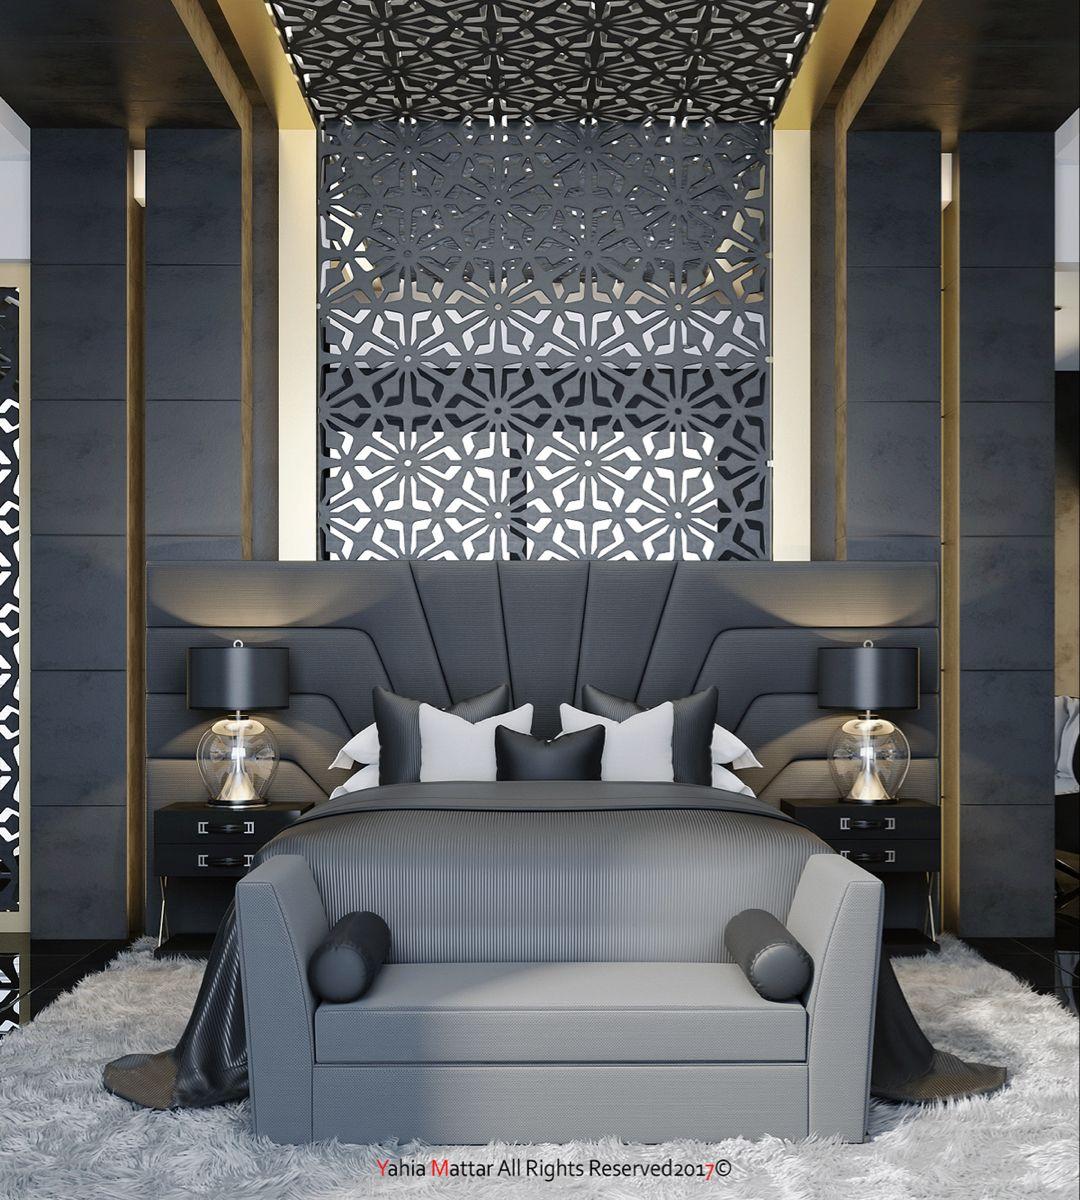 Luxury Master Bedroom Dubai On Behance: Luxury Bedroom Design, Bedroom